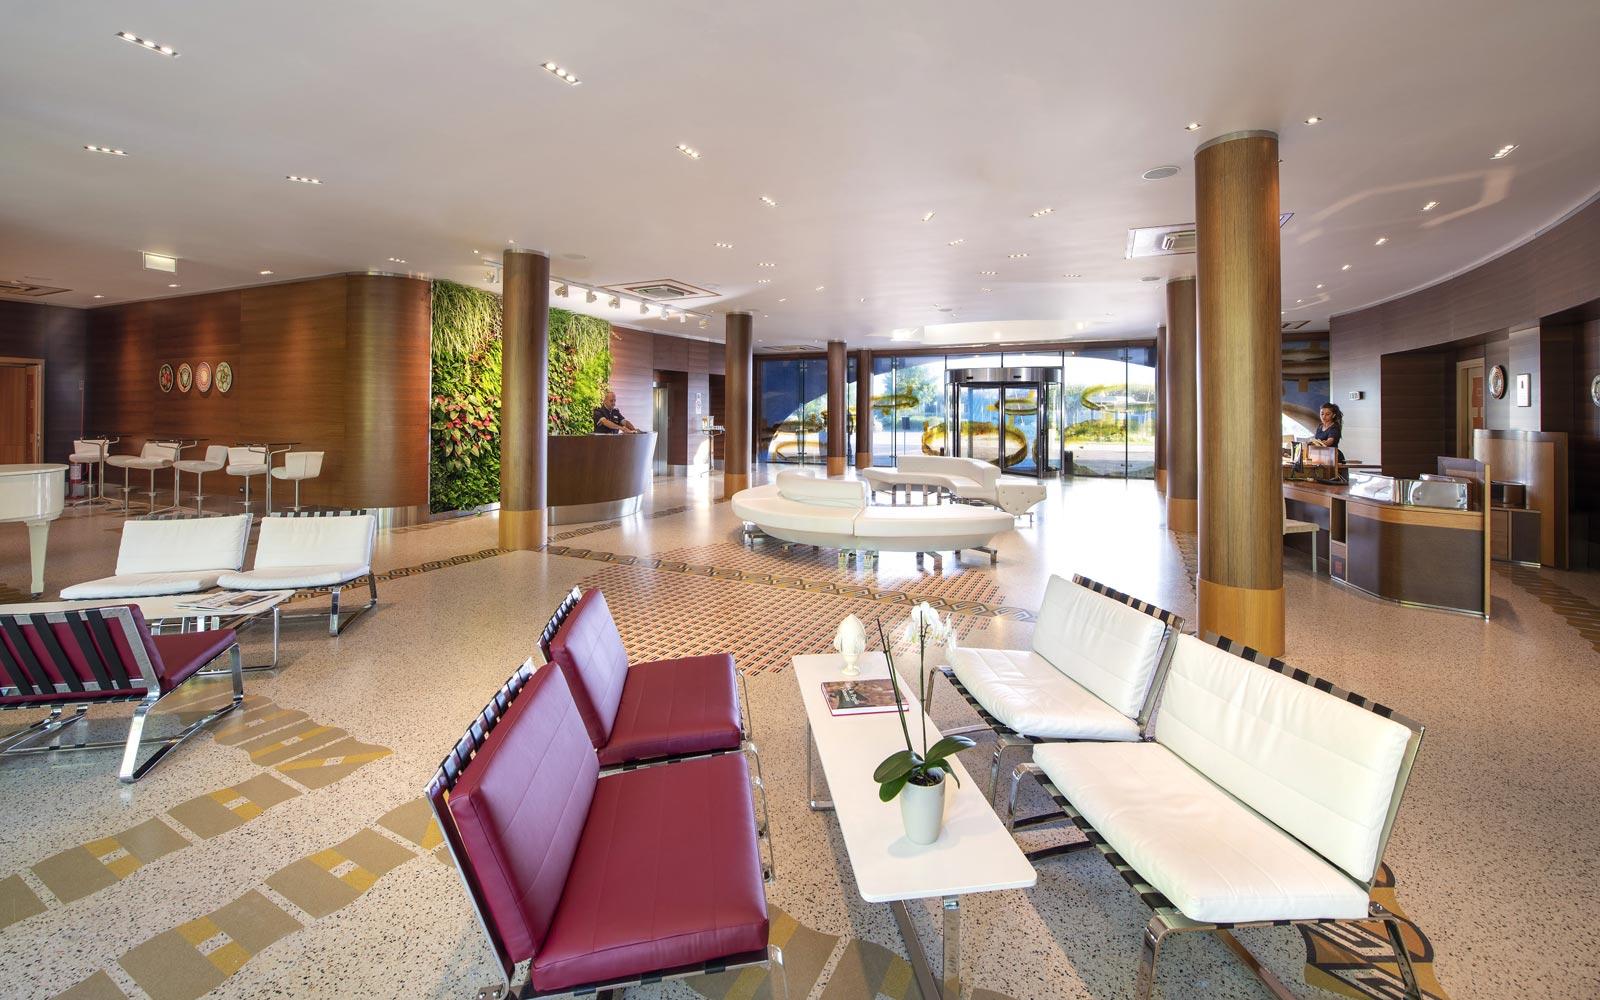 Kalidria Hotel & Thalasso Spa Reception Hall